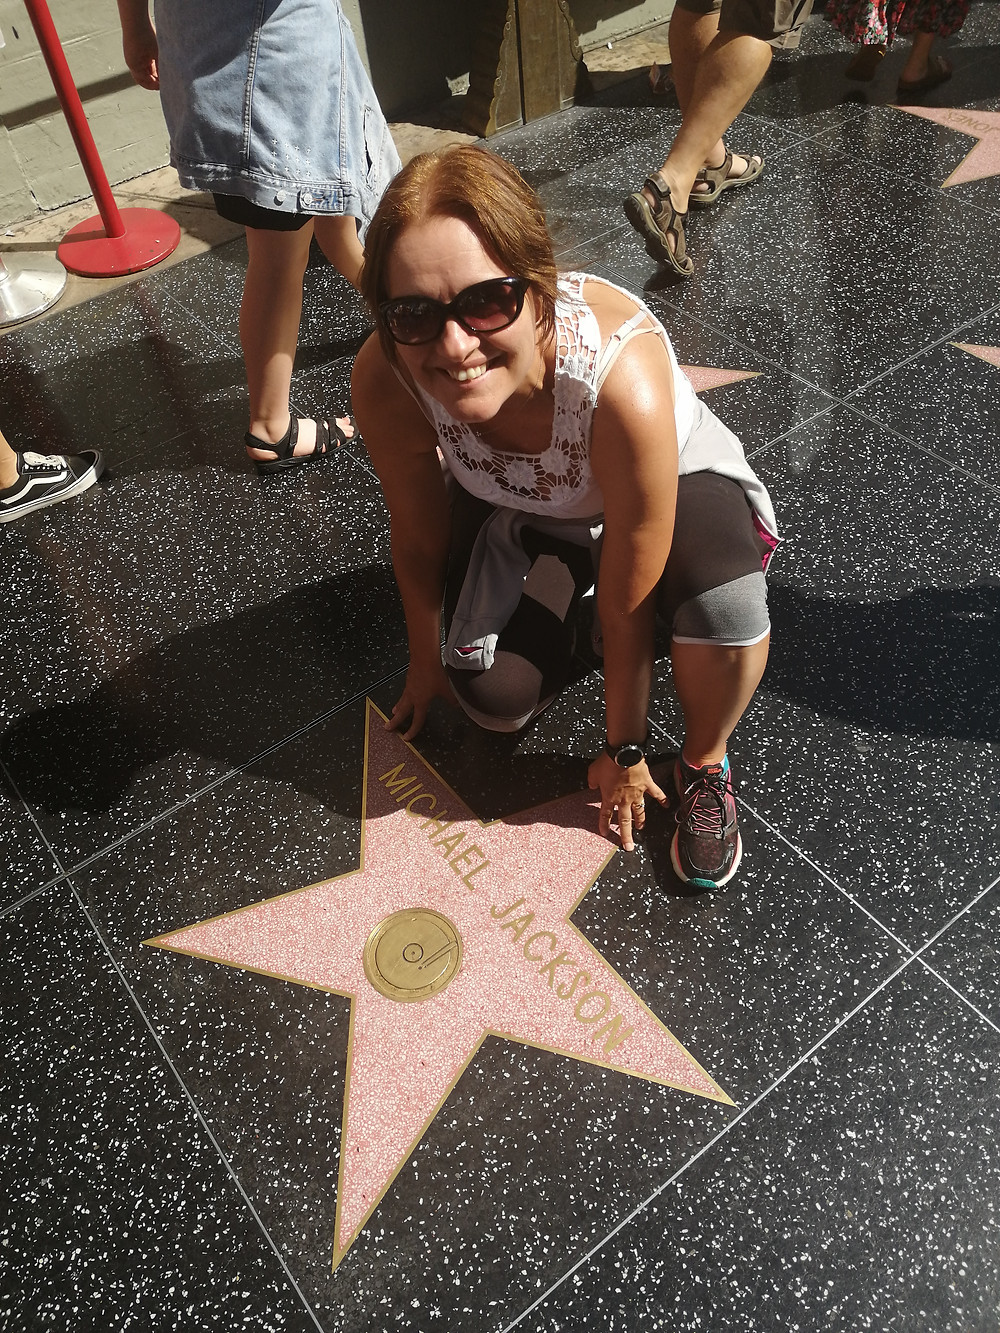 Sally aand Michael Jackson